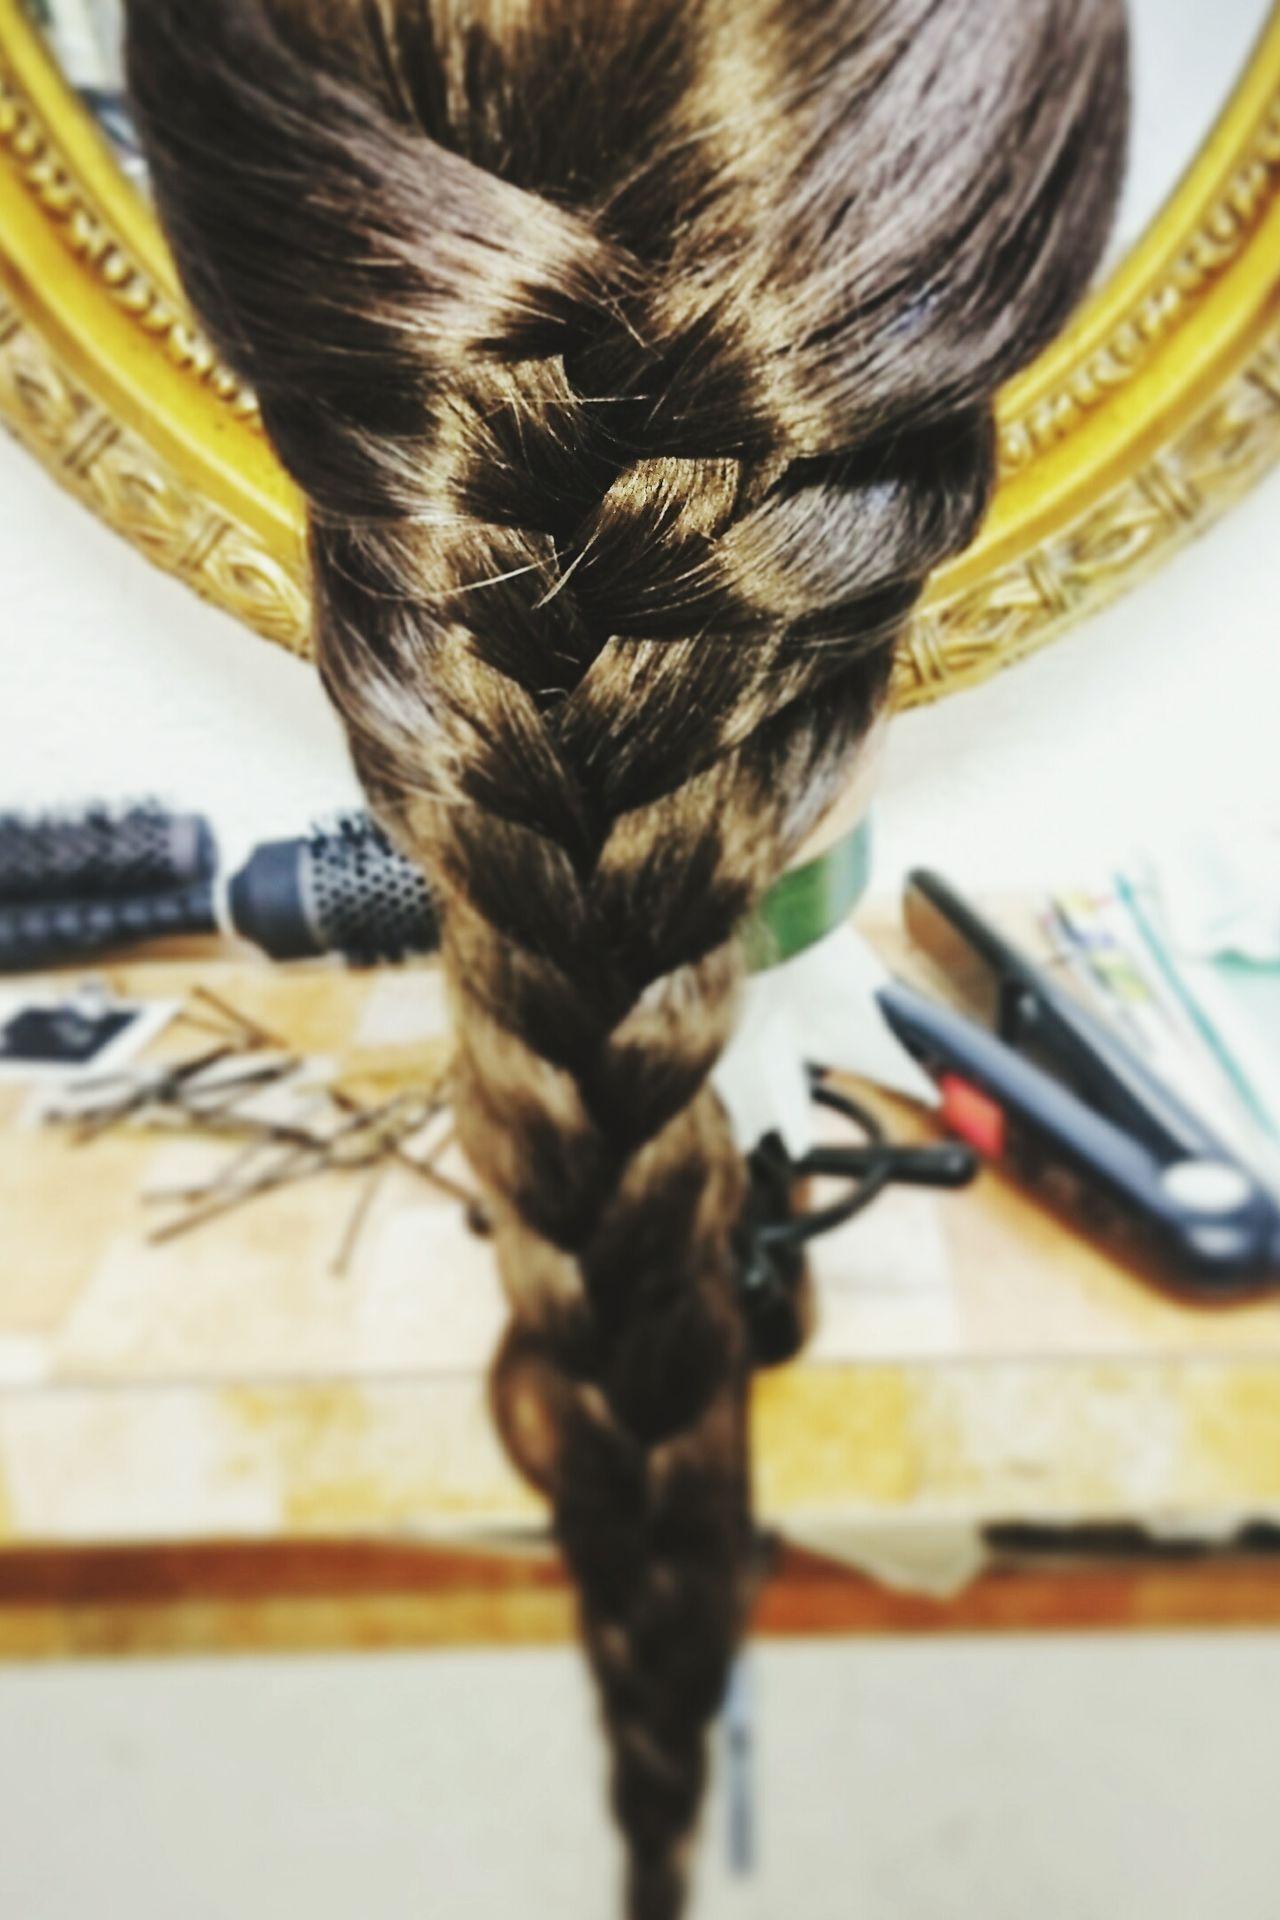 Beauty❤ Beauty In Everything Haircolor Hair Hairstyle Hairtrends Hairfashion Hairdye Hairstylist Hair Accessories Haare Haircare First Eyeem Photo HairExtensions Hair Salon Hair Style Haircolour